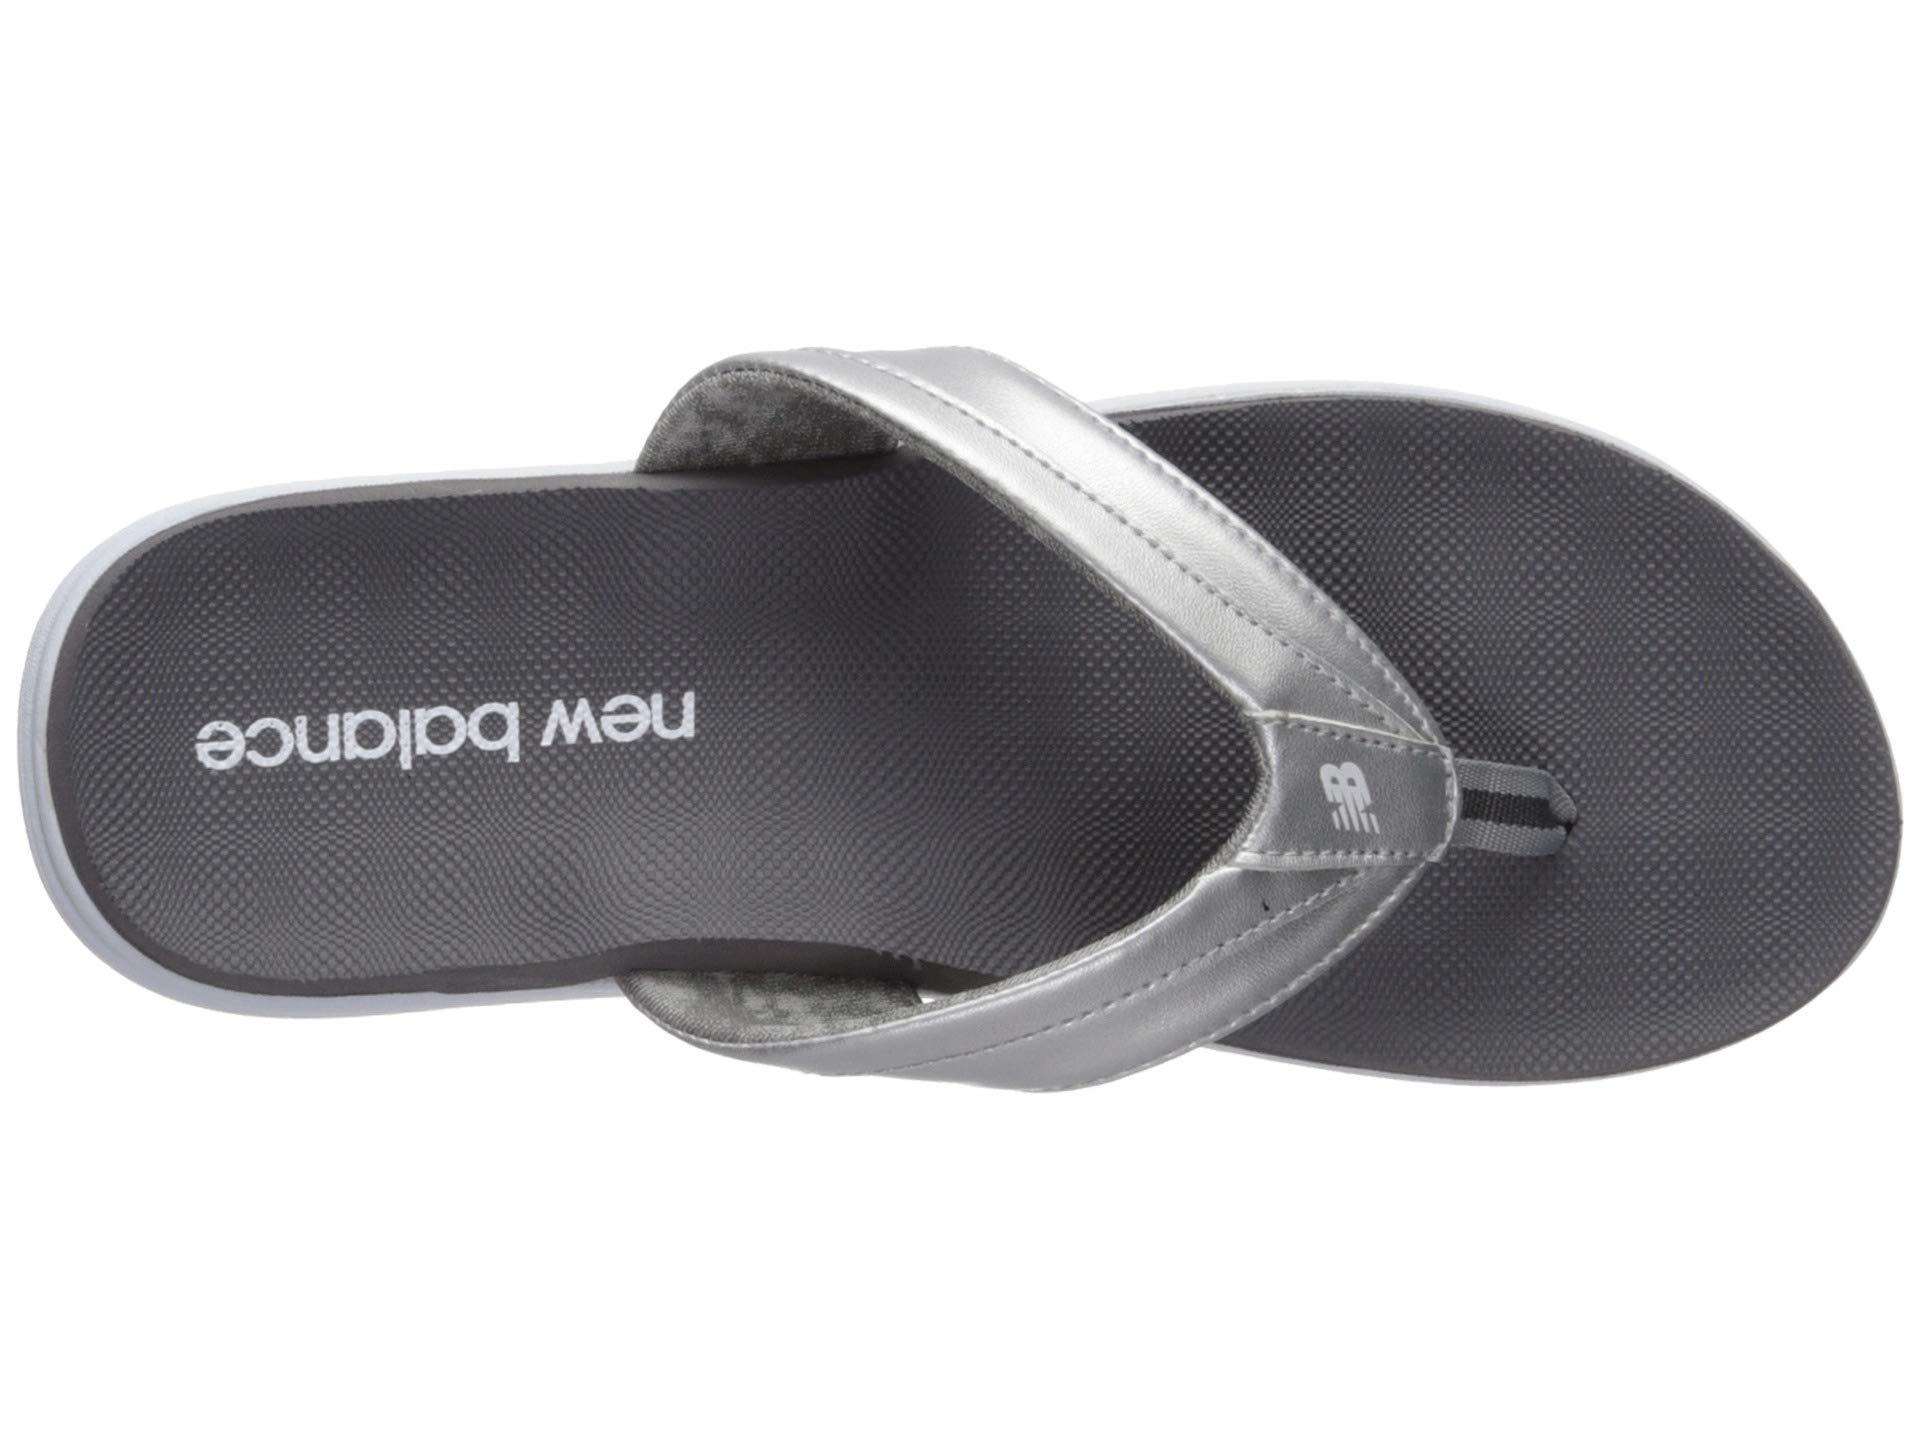 c0b638cdd1b New Balance - Jojo Thong (white black) Women s Sandals - Lyst. View  fullscreen